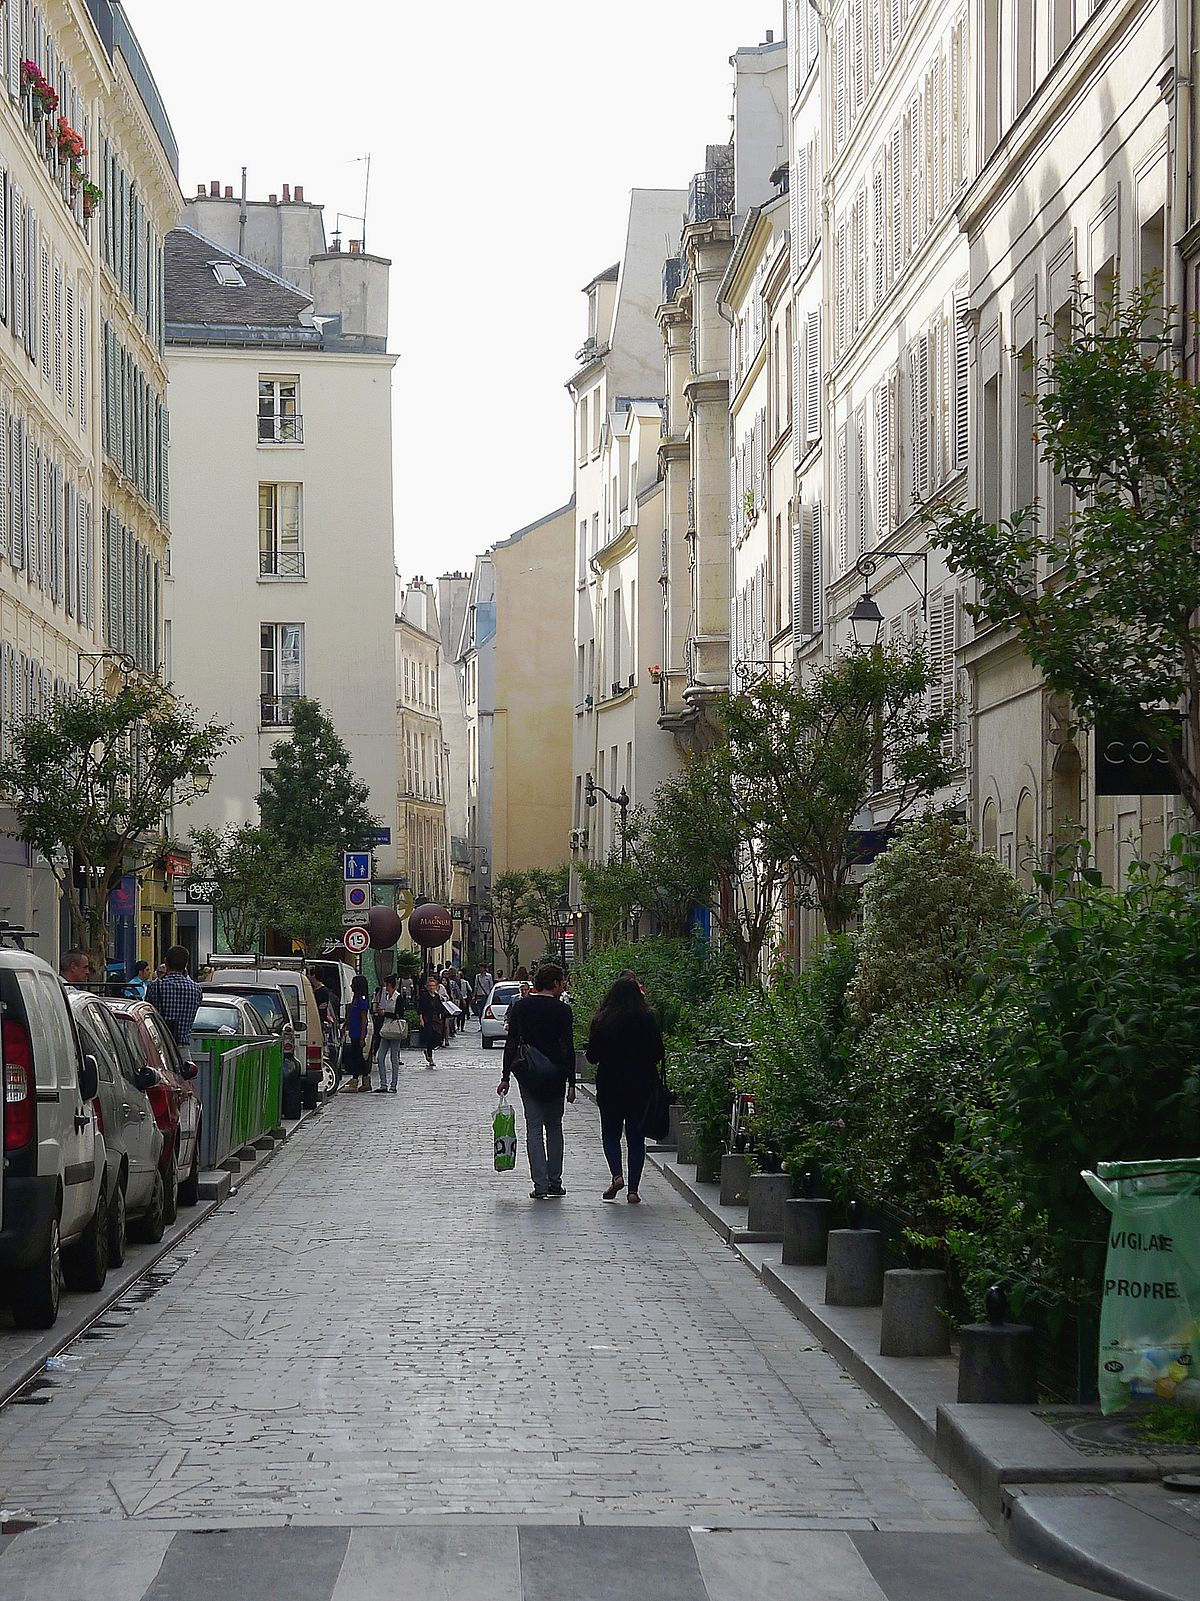 du r u00e9becca rue des rosiers  u2014 wikip u00e9dia